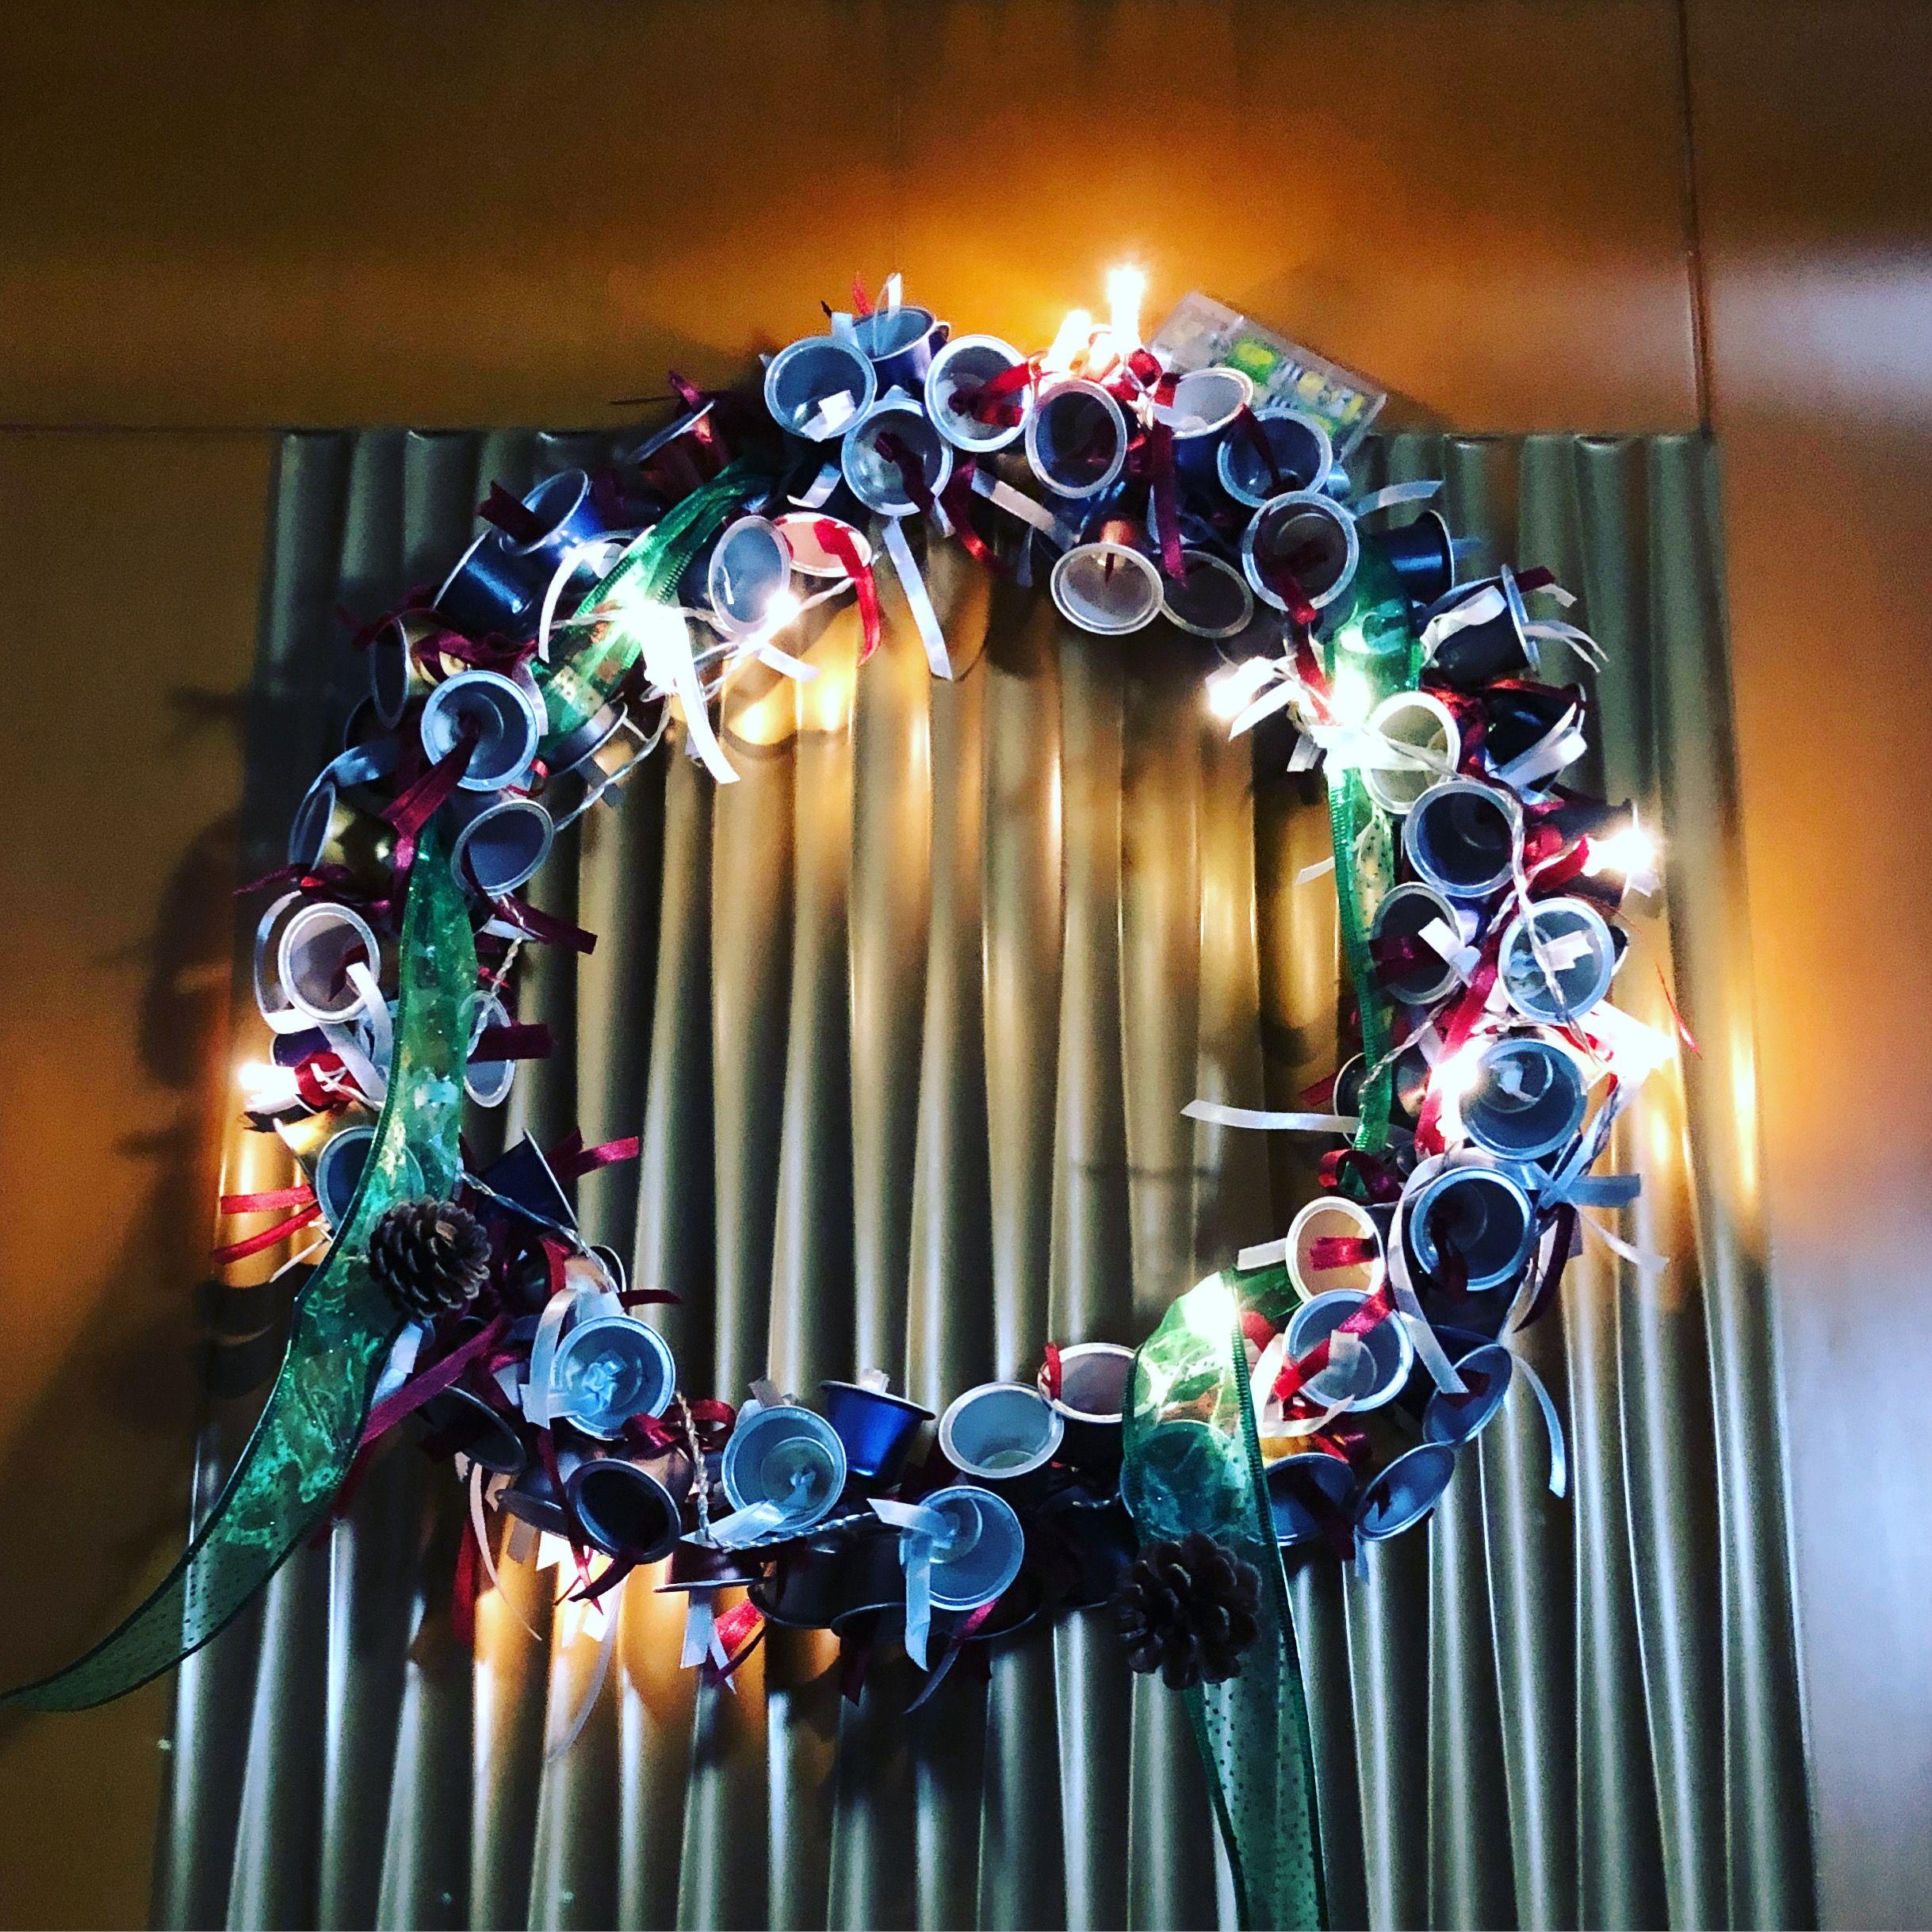 Recycled Nespresso Pods Christmas Wreath Christmas Wreaths Wreaths Hanukkah Wreath